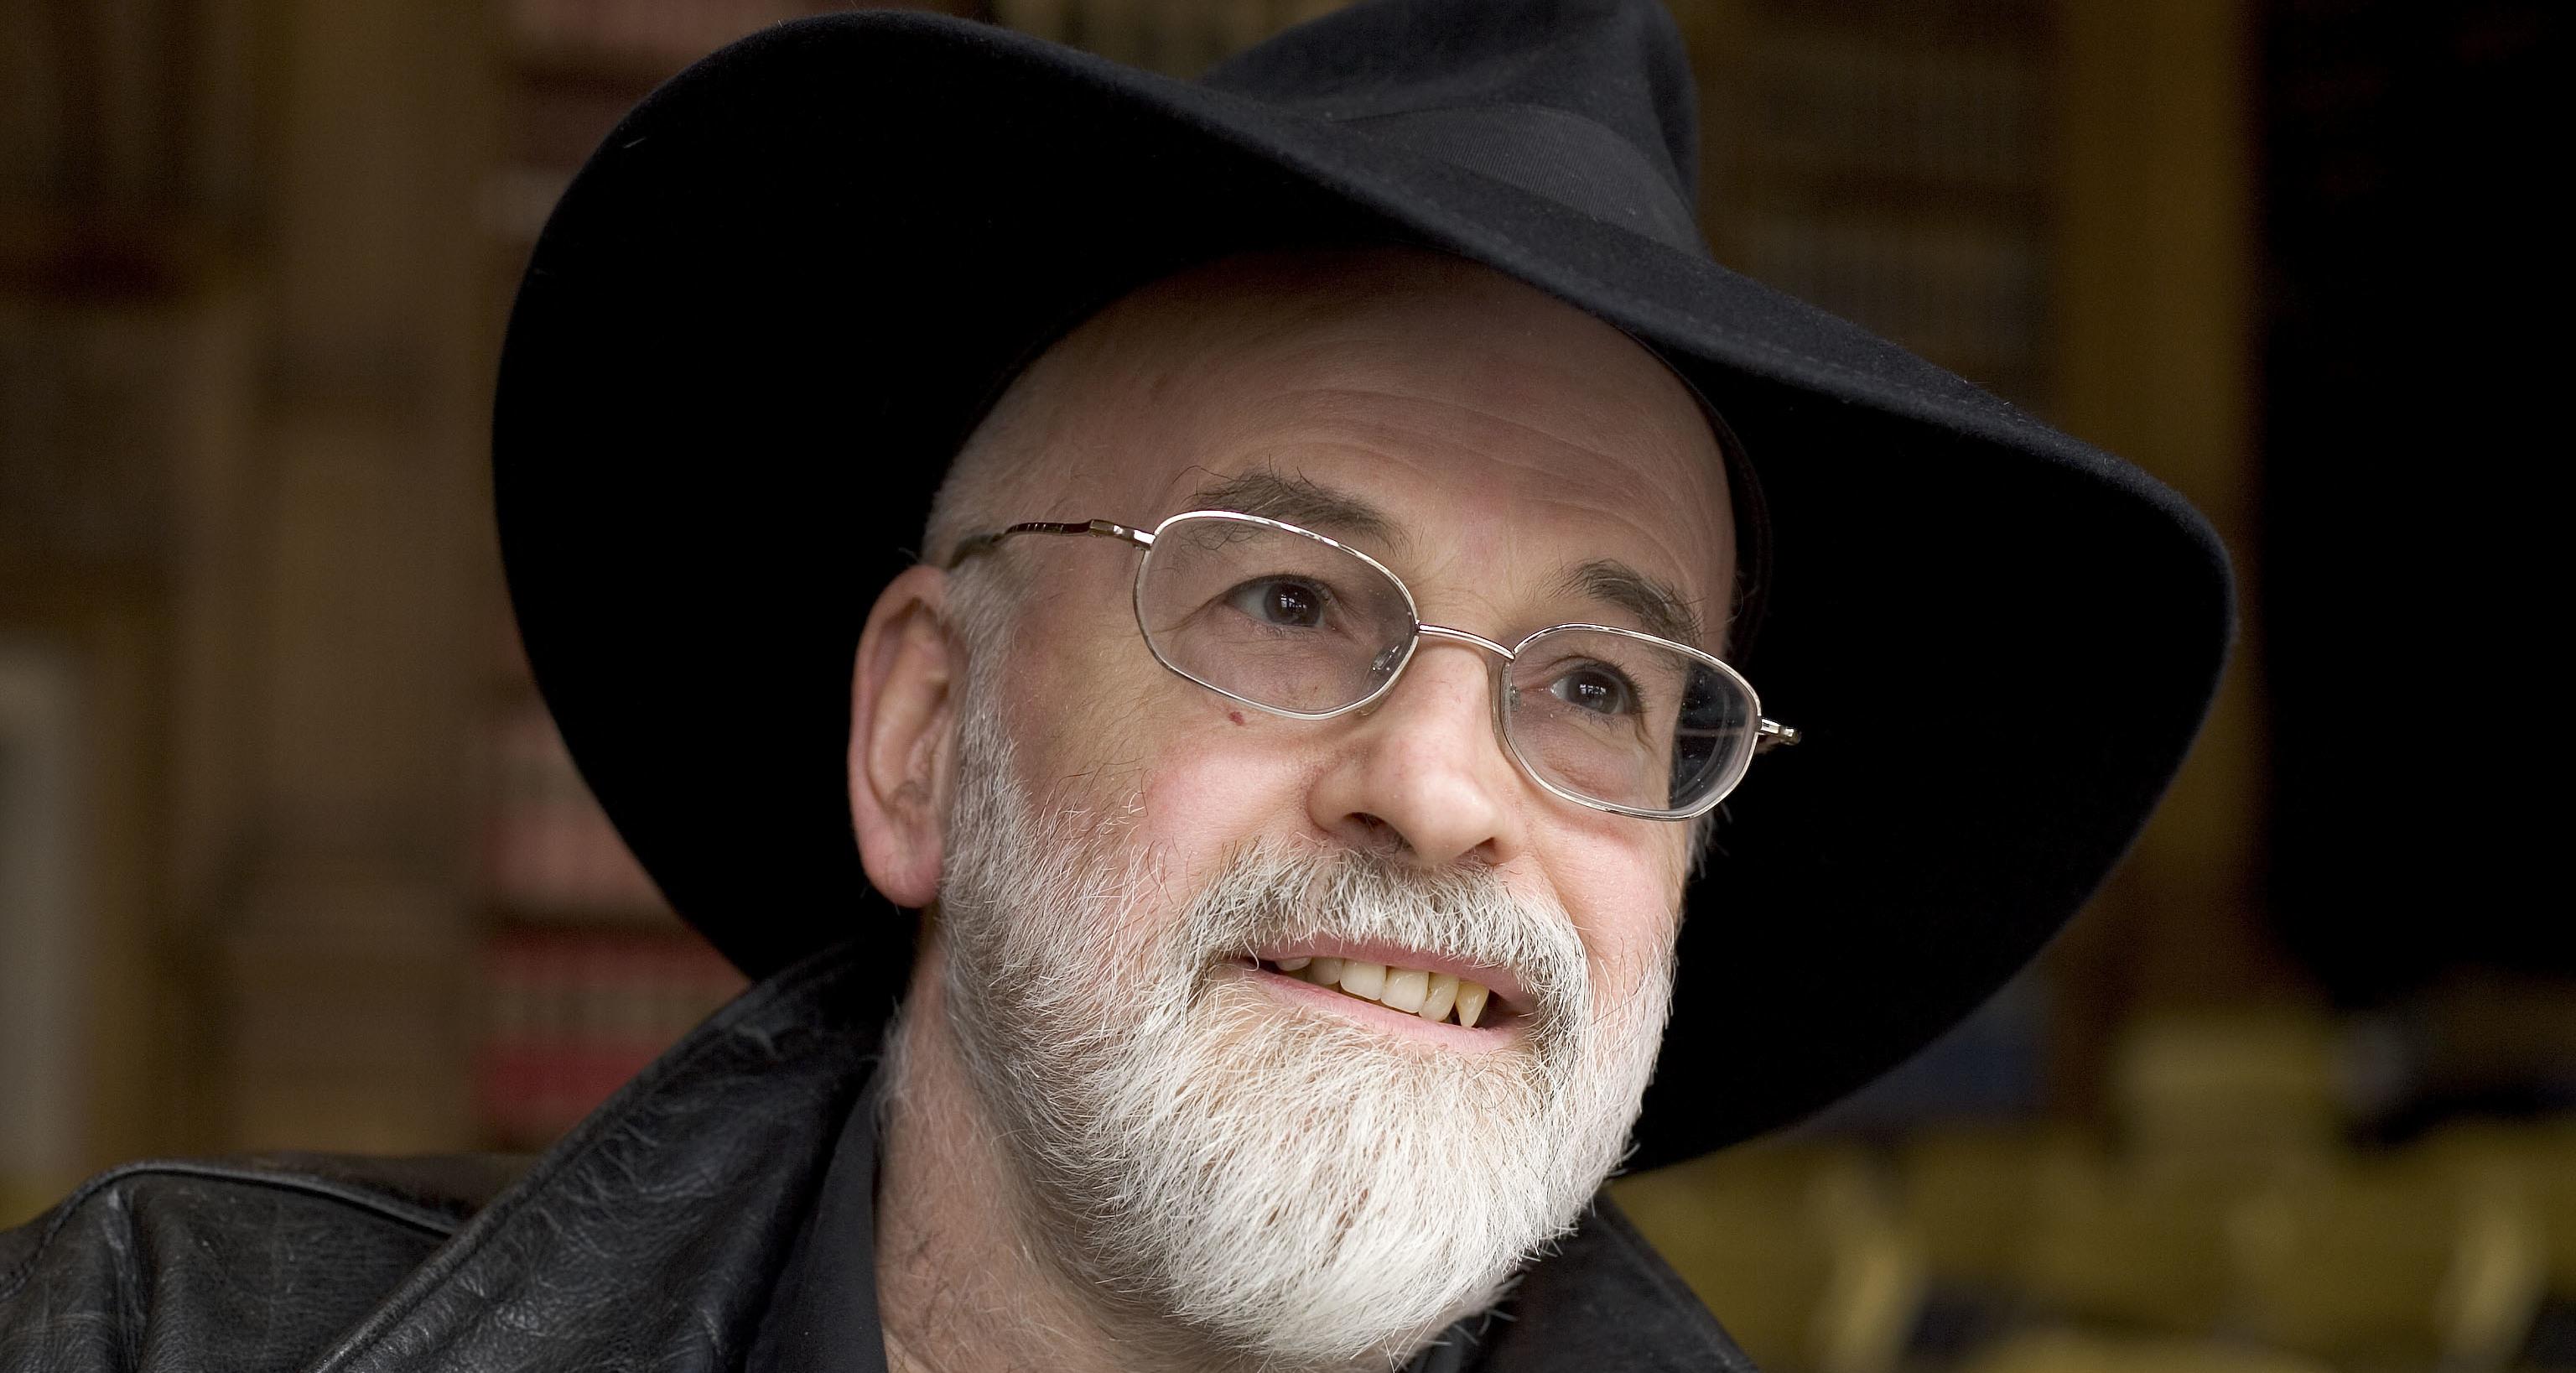 Final Terry Pratchett Stories Coming in September